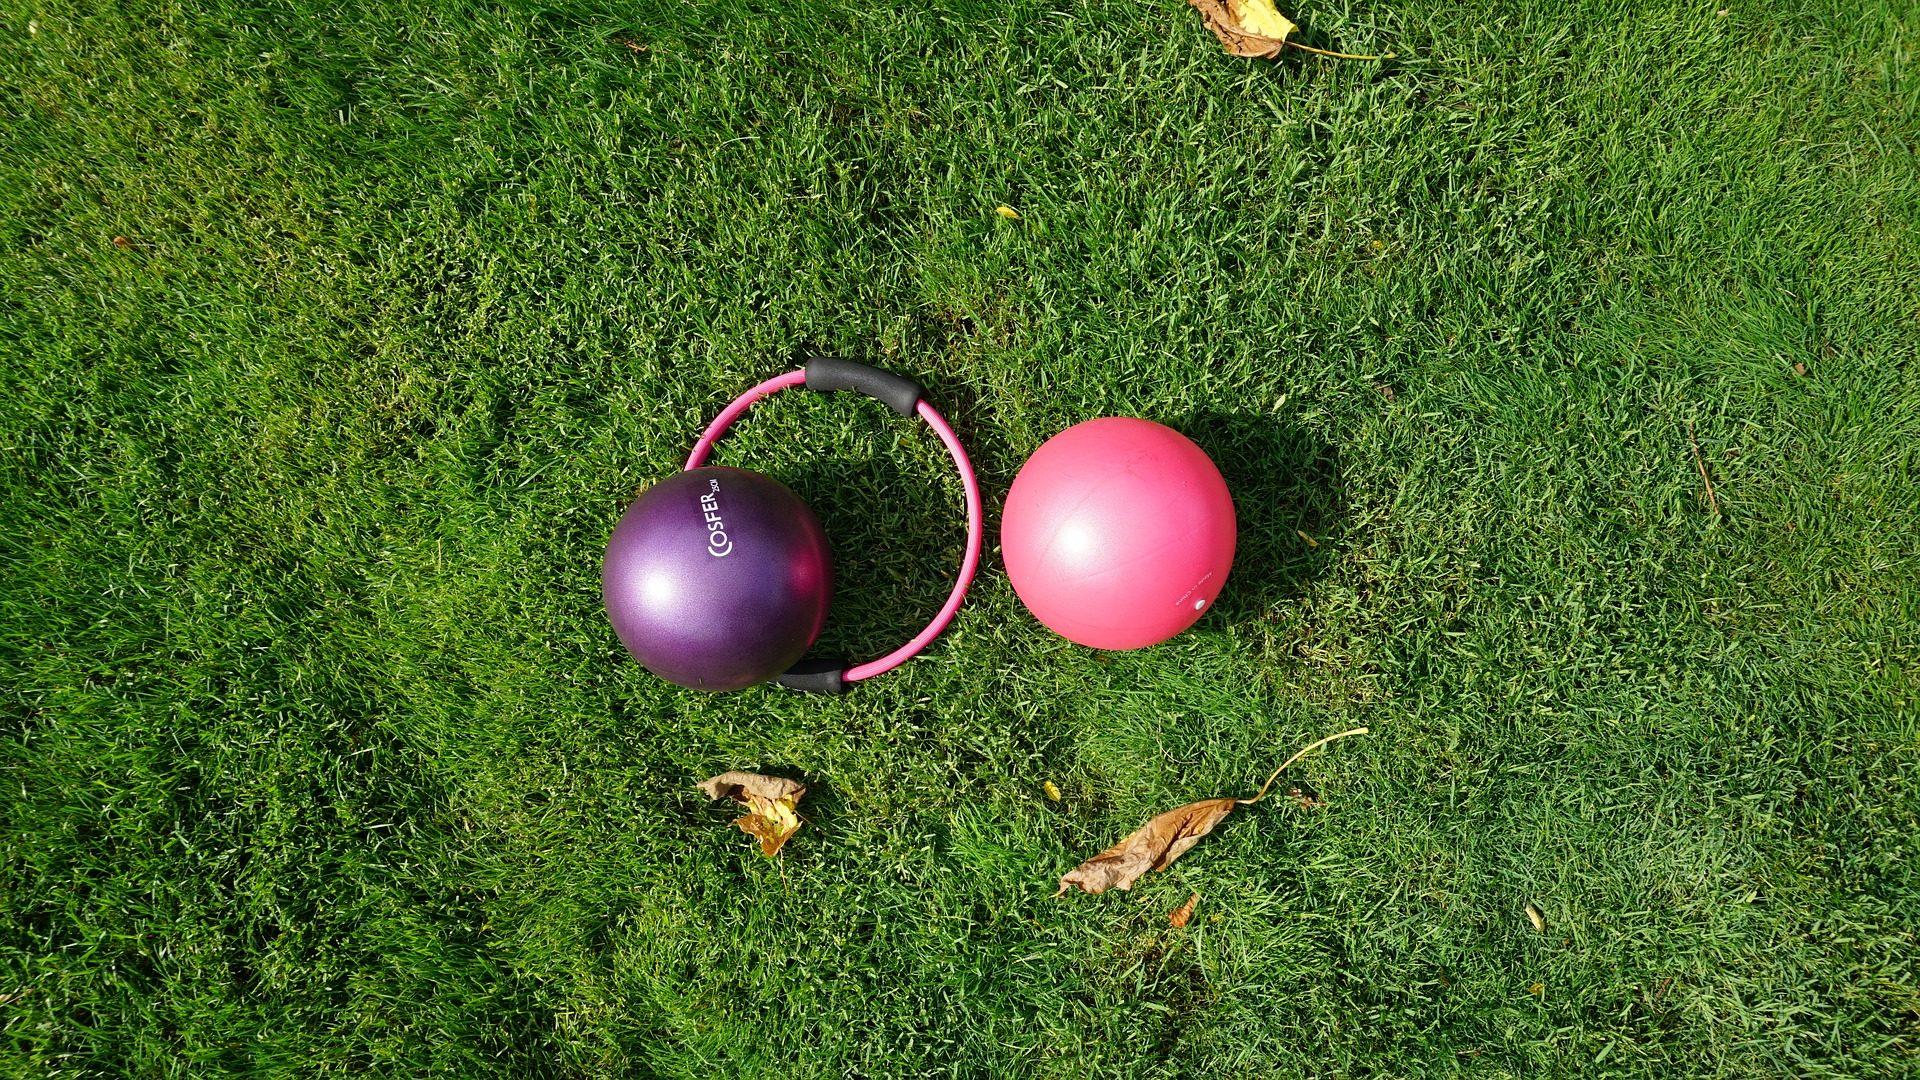 pelotas, ボール, ピラティス, リング, 芝生, オープンエアします。, 運動 - HD の壁紙 - 教授-falken.com